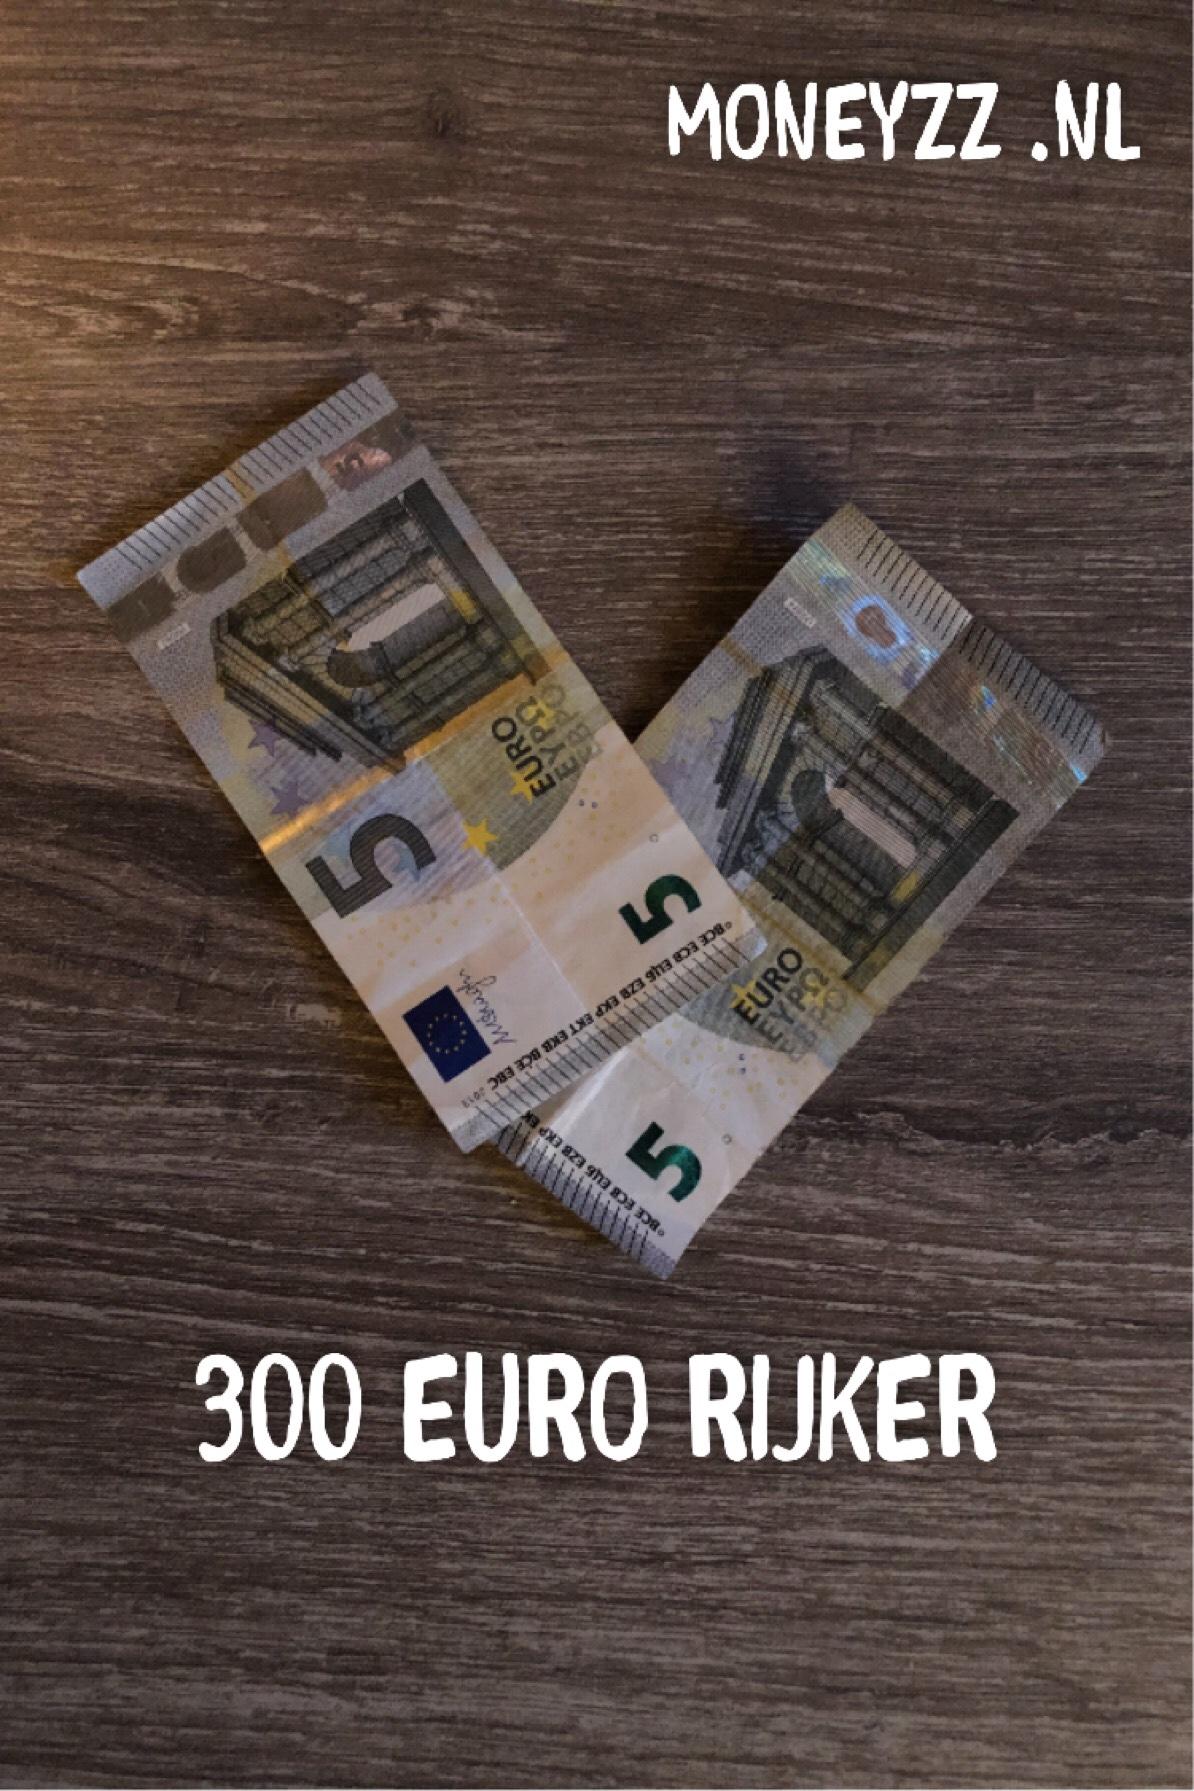 300 euro rijker